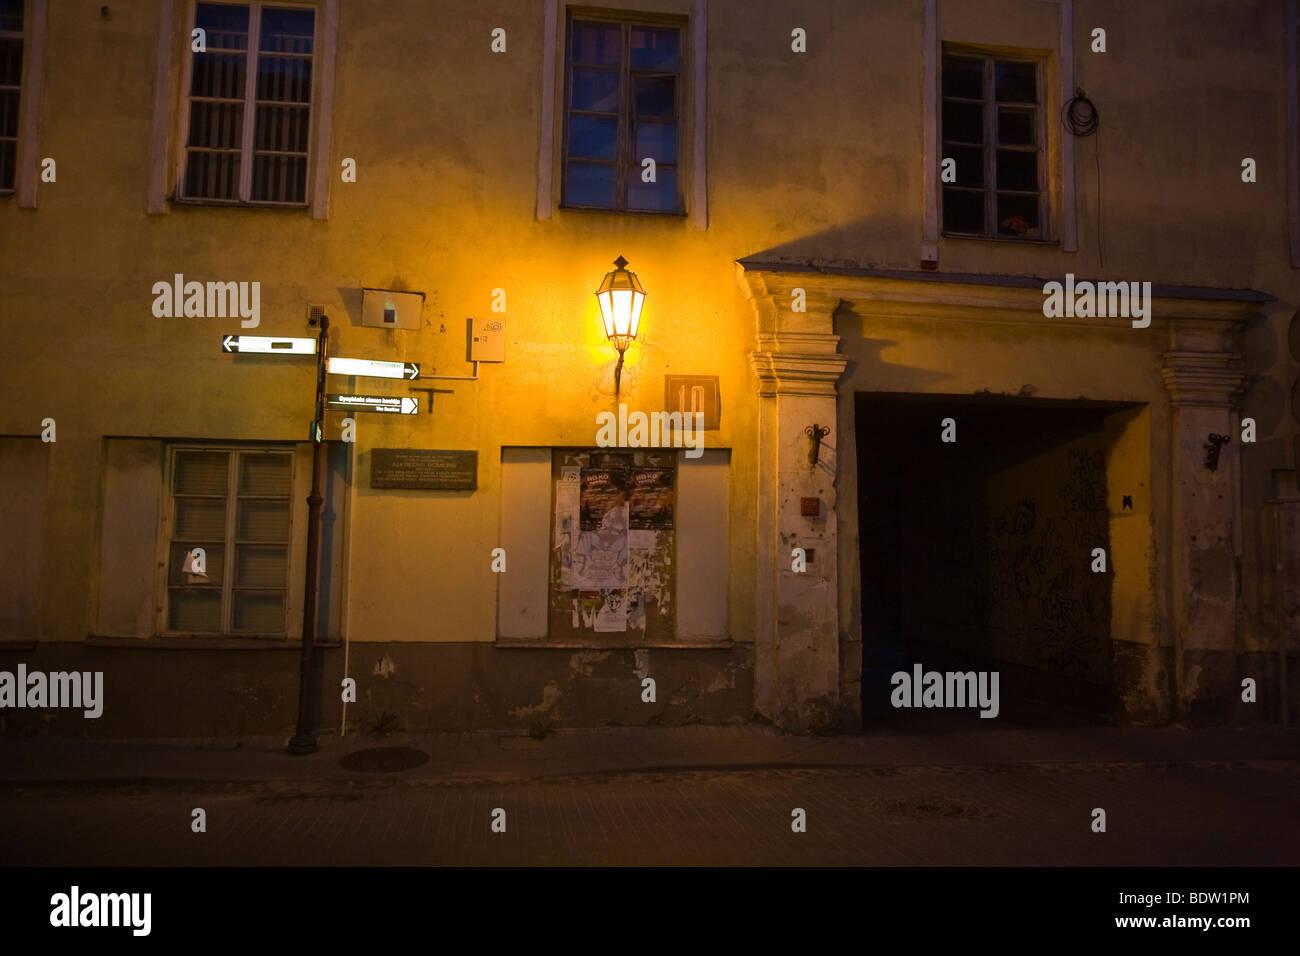 gasse in altstadt bei nacht, alley in old town at night, vilnius, vilna, litauen, lithuania Stock Photo